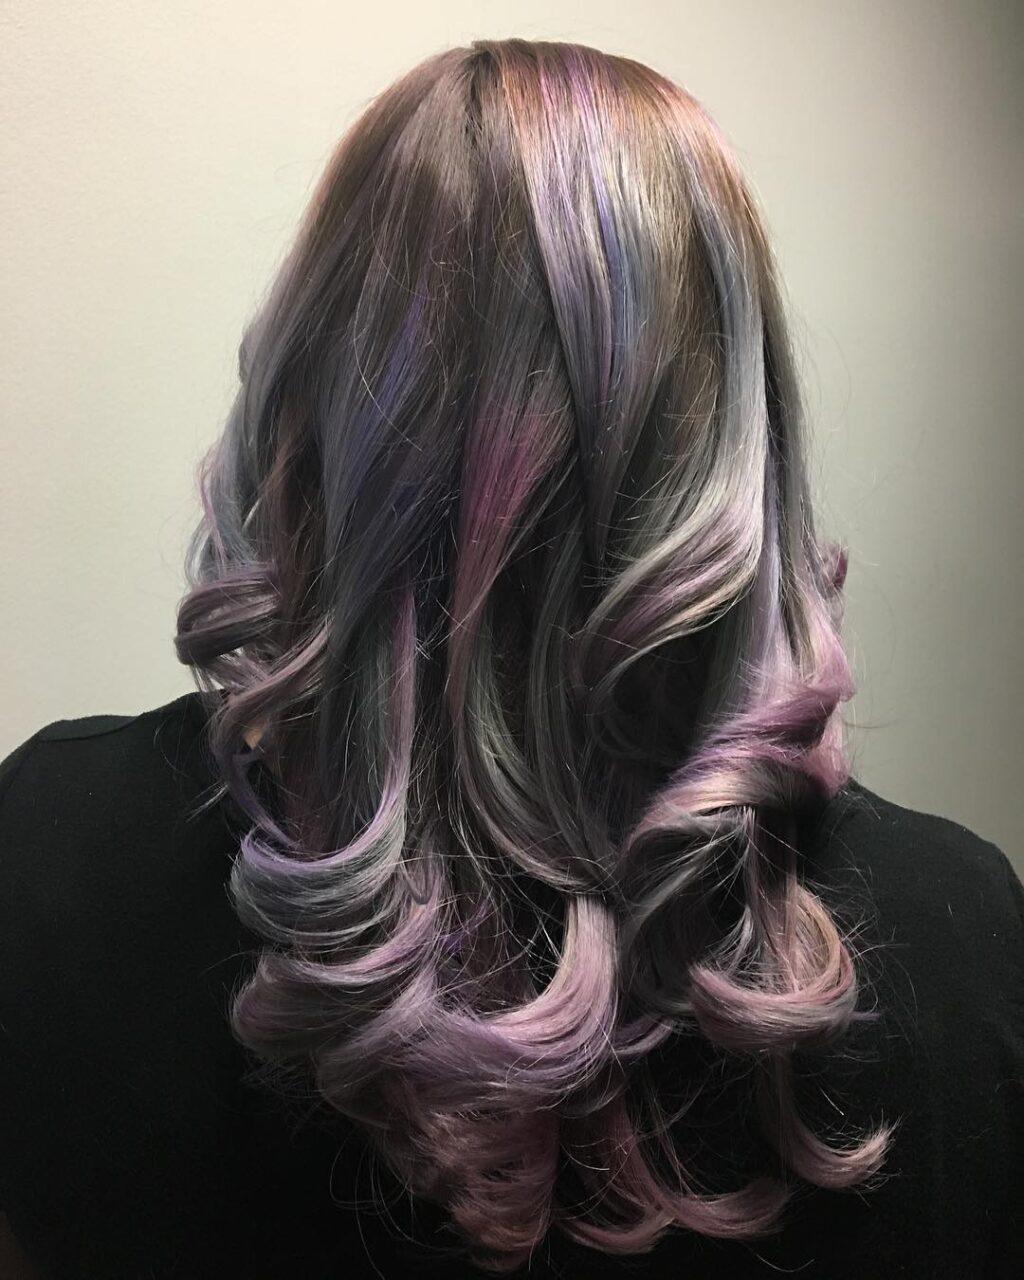 Oil slick hair blonde